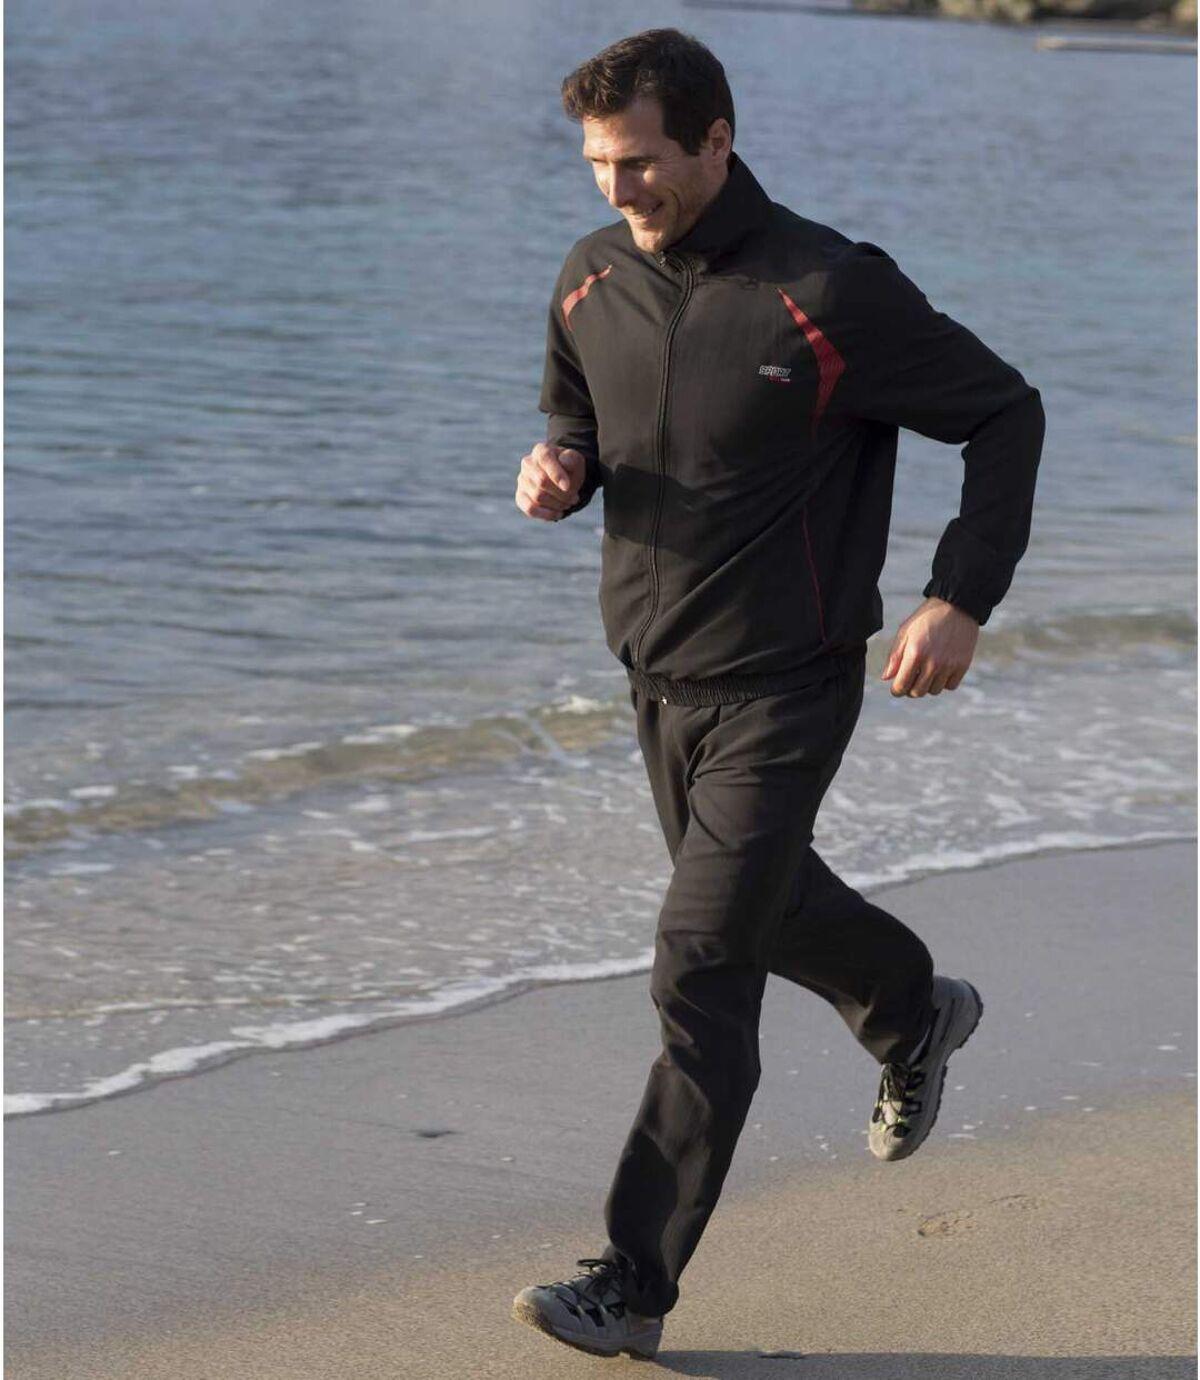 Športová súprava z mikrovlákna Running Atlas For Men